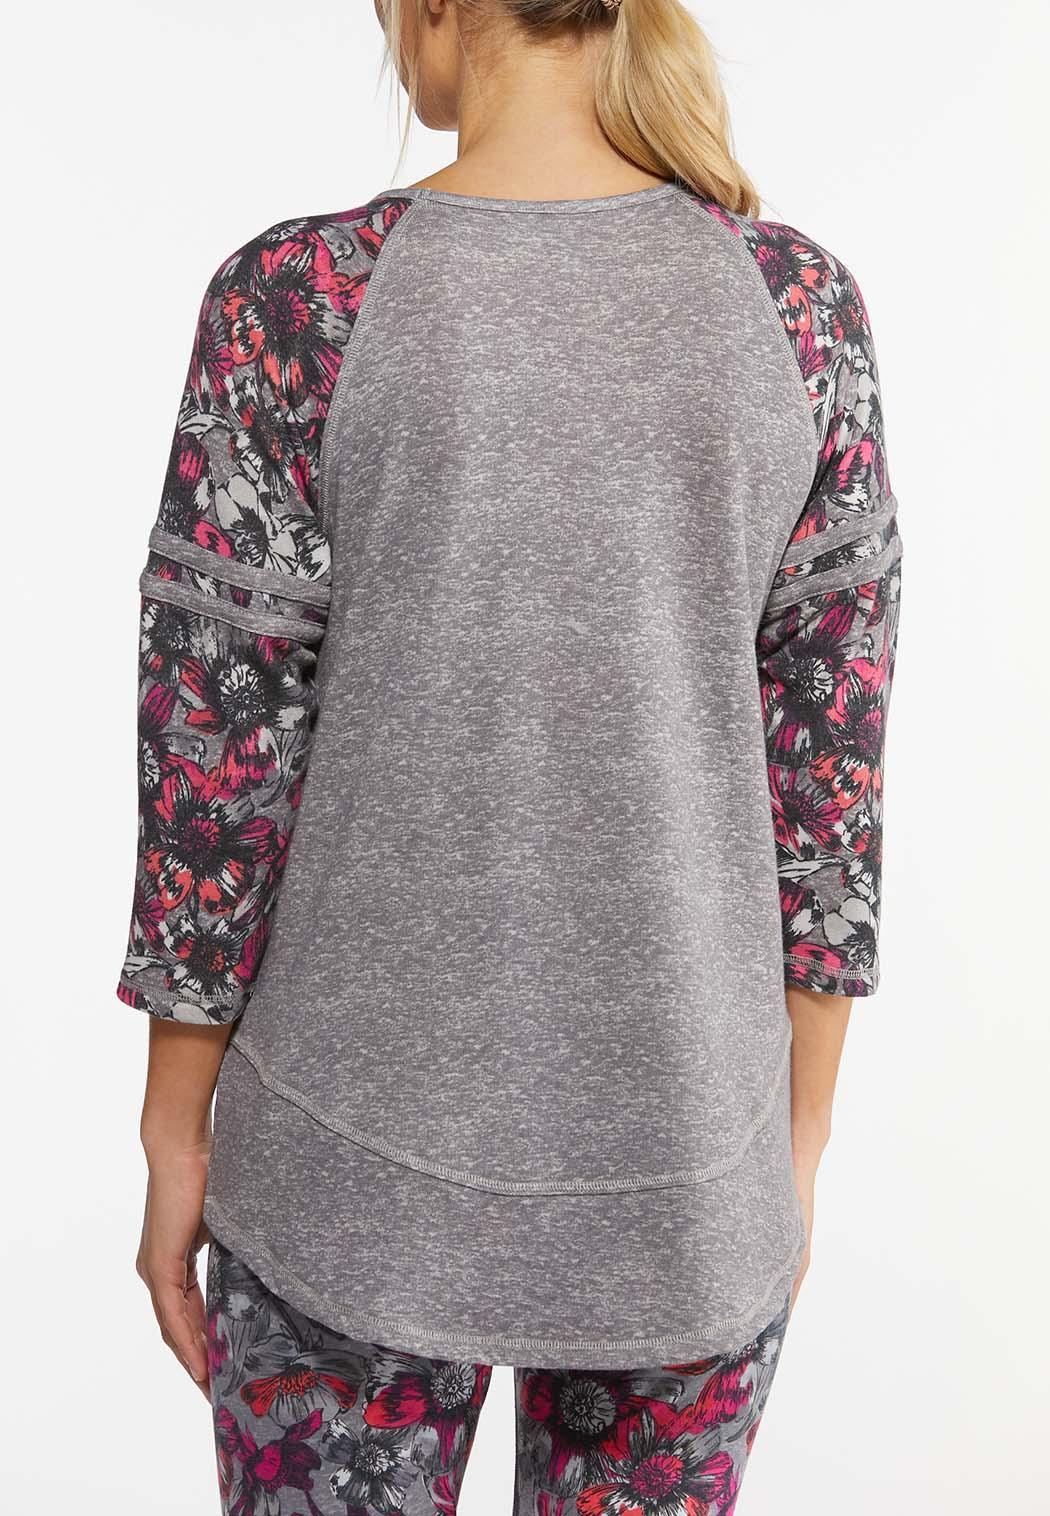 Floral Sleeve Baseball Top (Item #44462763)